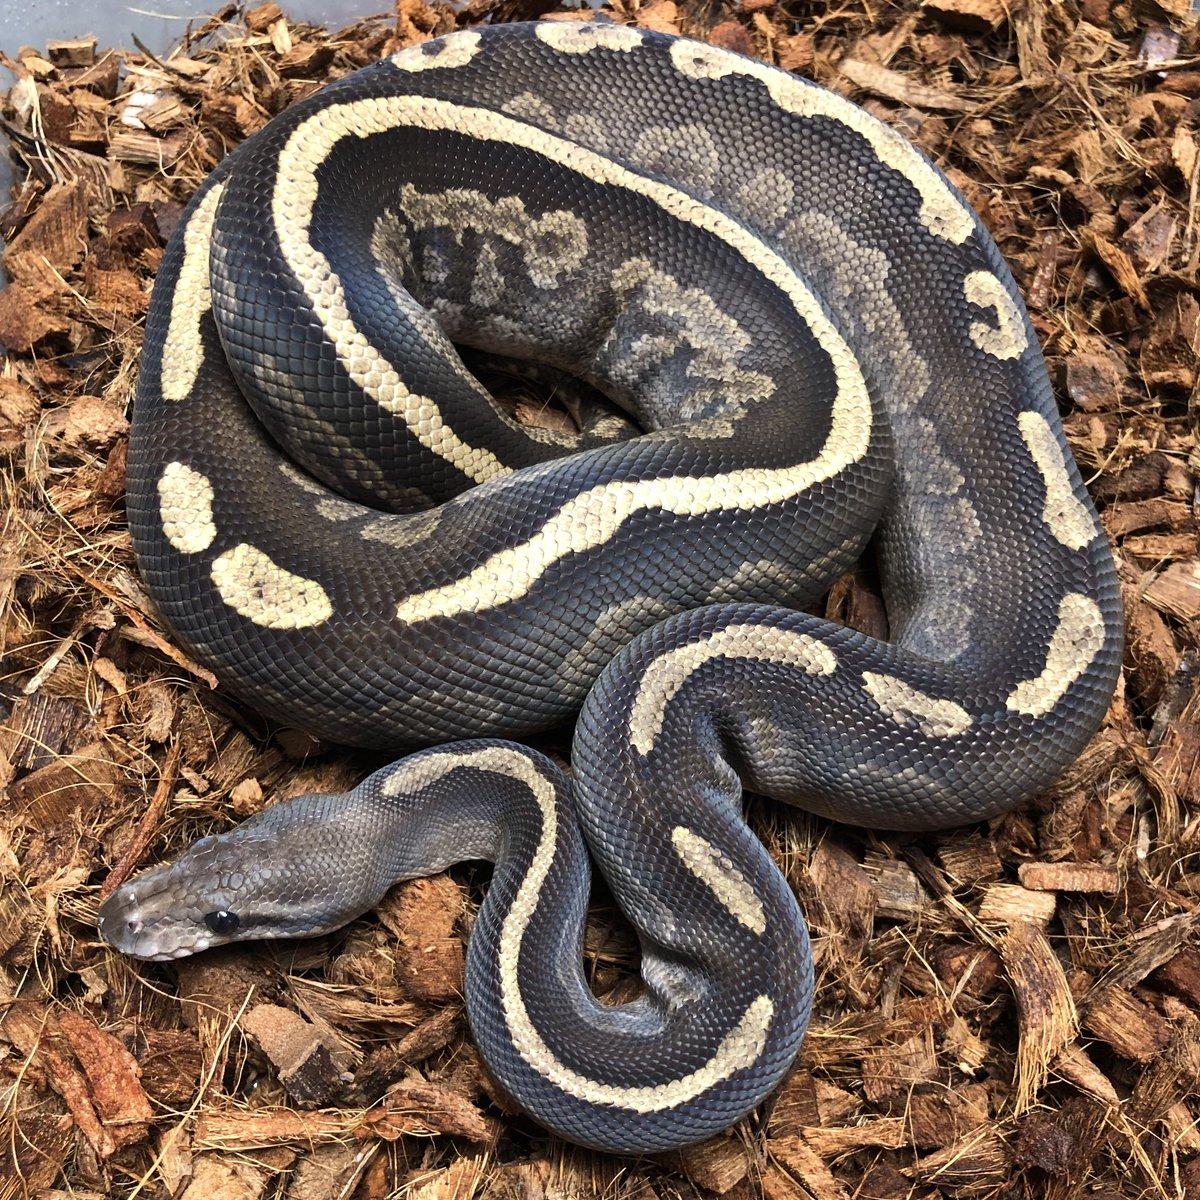 Morph Mixology Reptiles (@MorphMixology)   Twitter